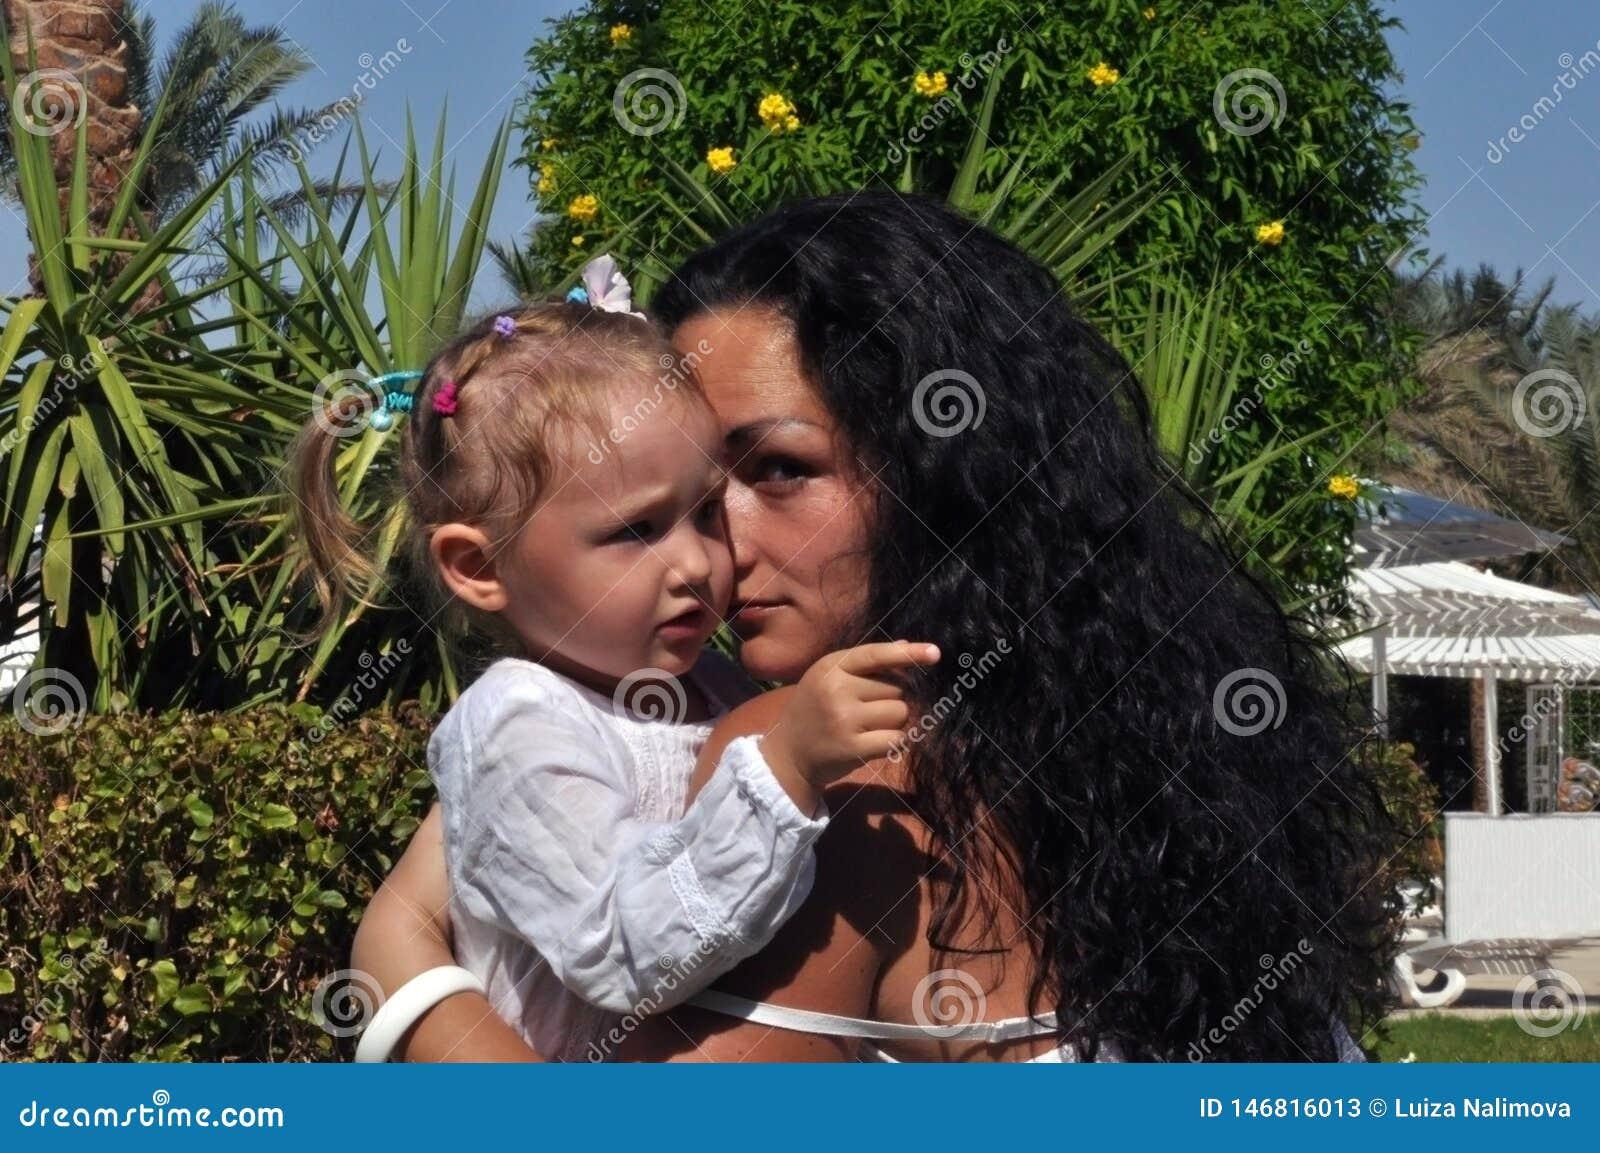 En kvinna med långt svart lockigt hår omfamnar hennes dotter på en solig dag